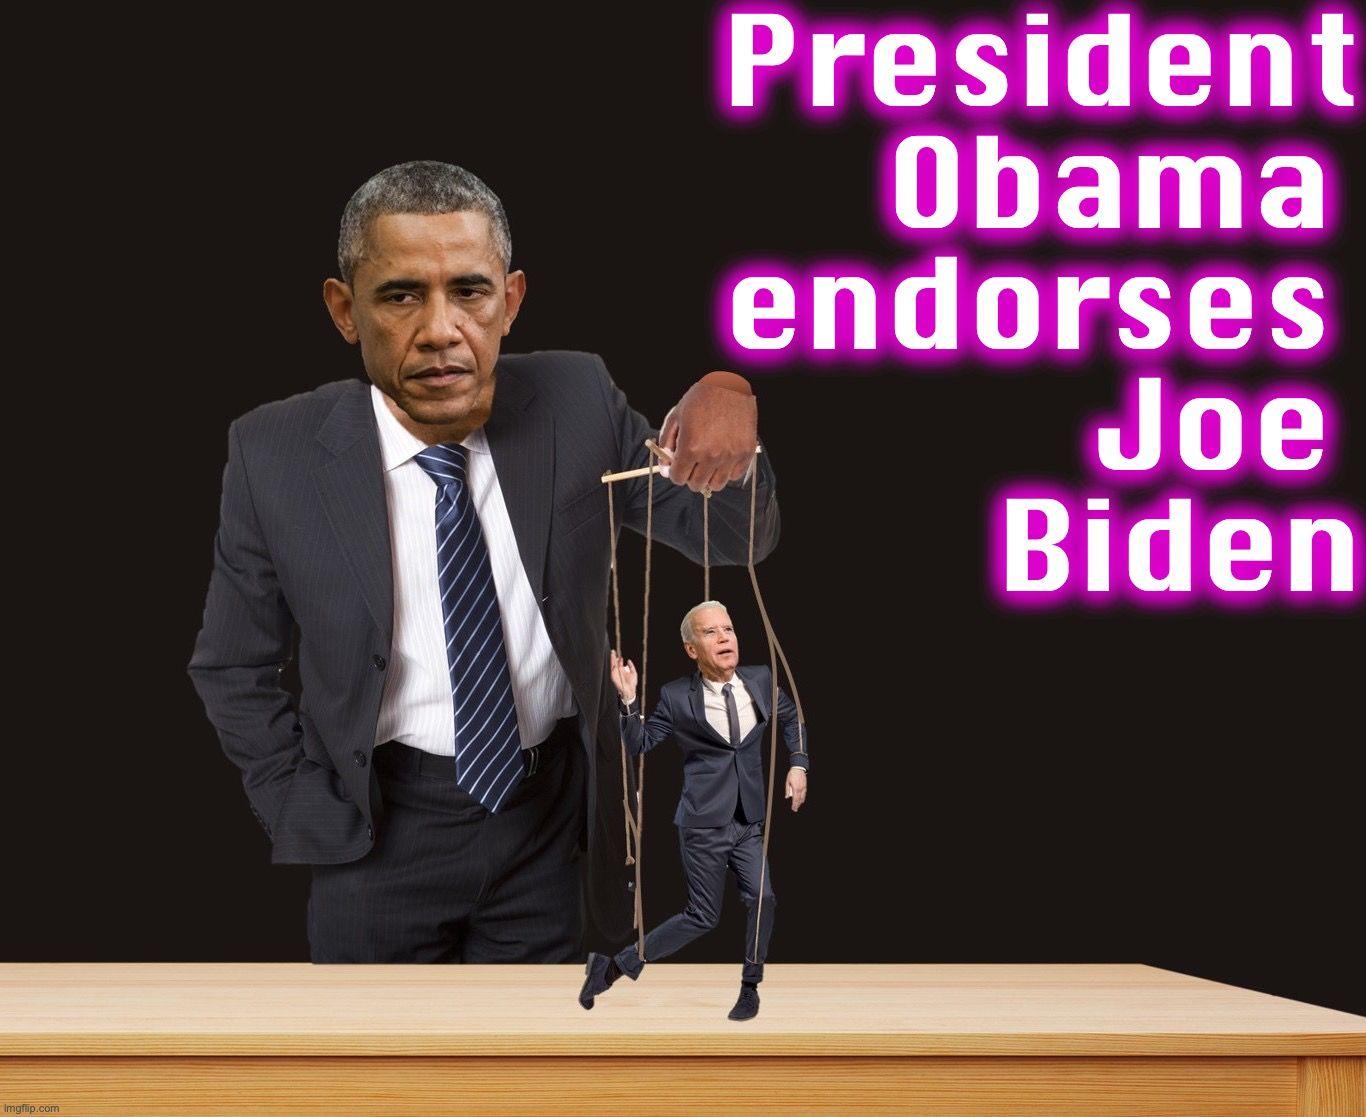 obamabidenpuppetmasterdkfsdfhskf.jpg